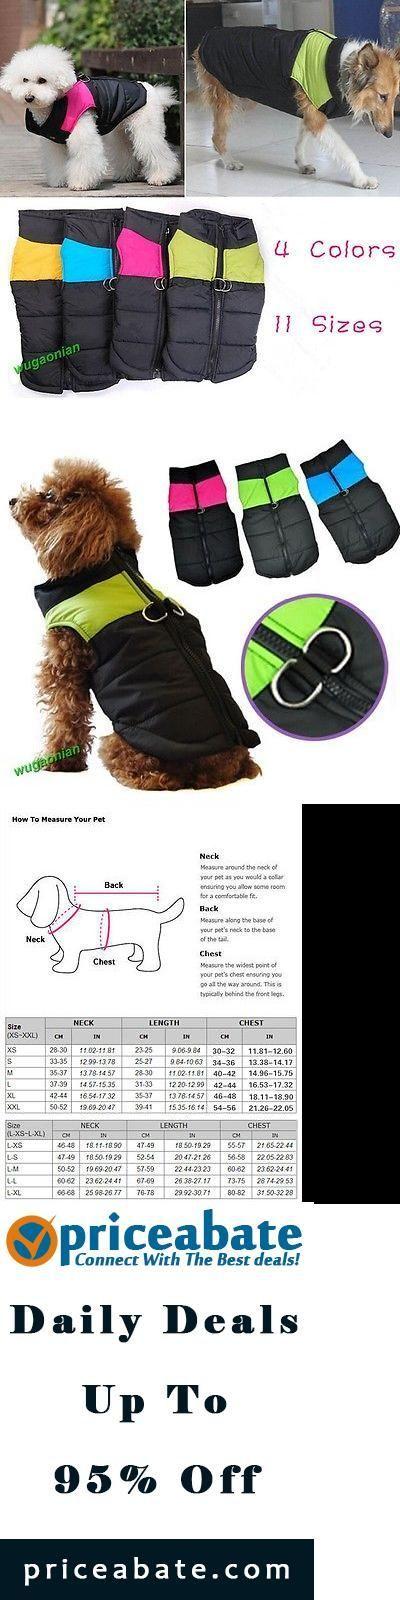 Dog accessories [ 24hrPetSupplies.com ]